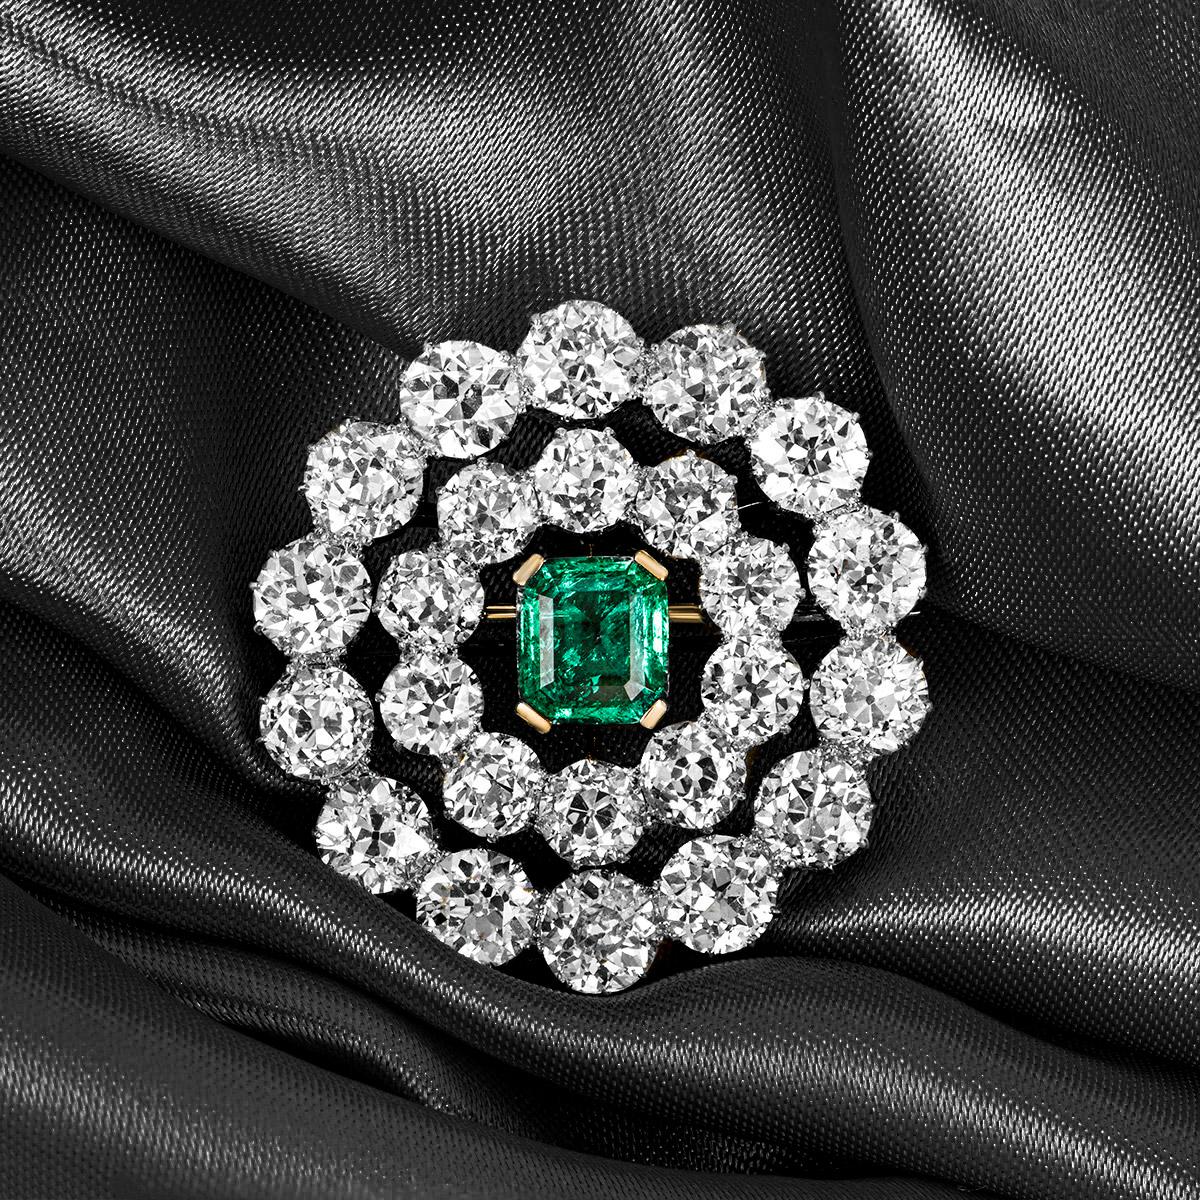 Early 20th Century Emerald and Diamond Brooch/Pendant